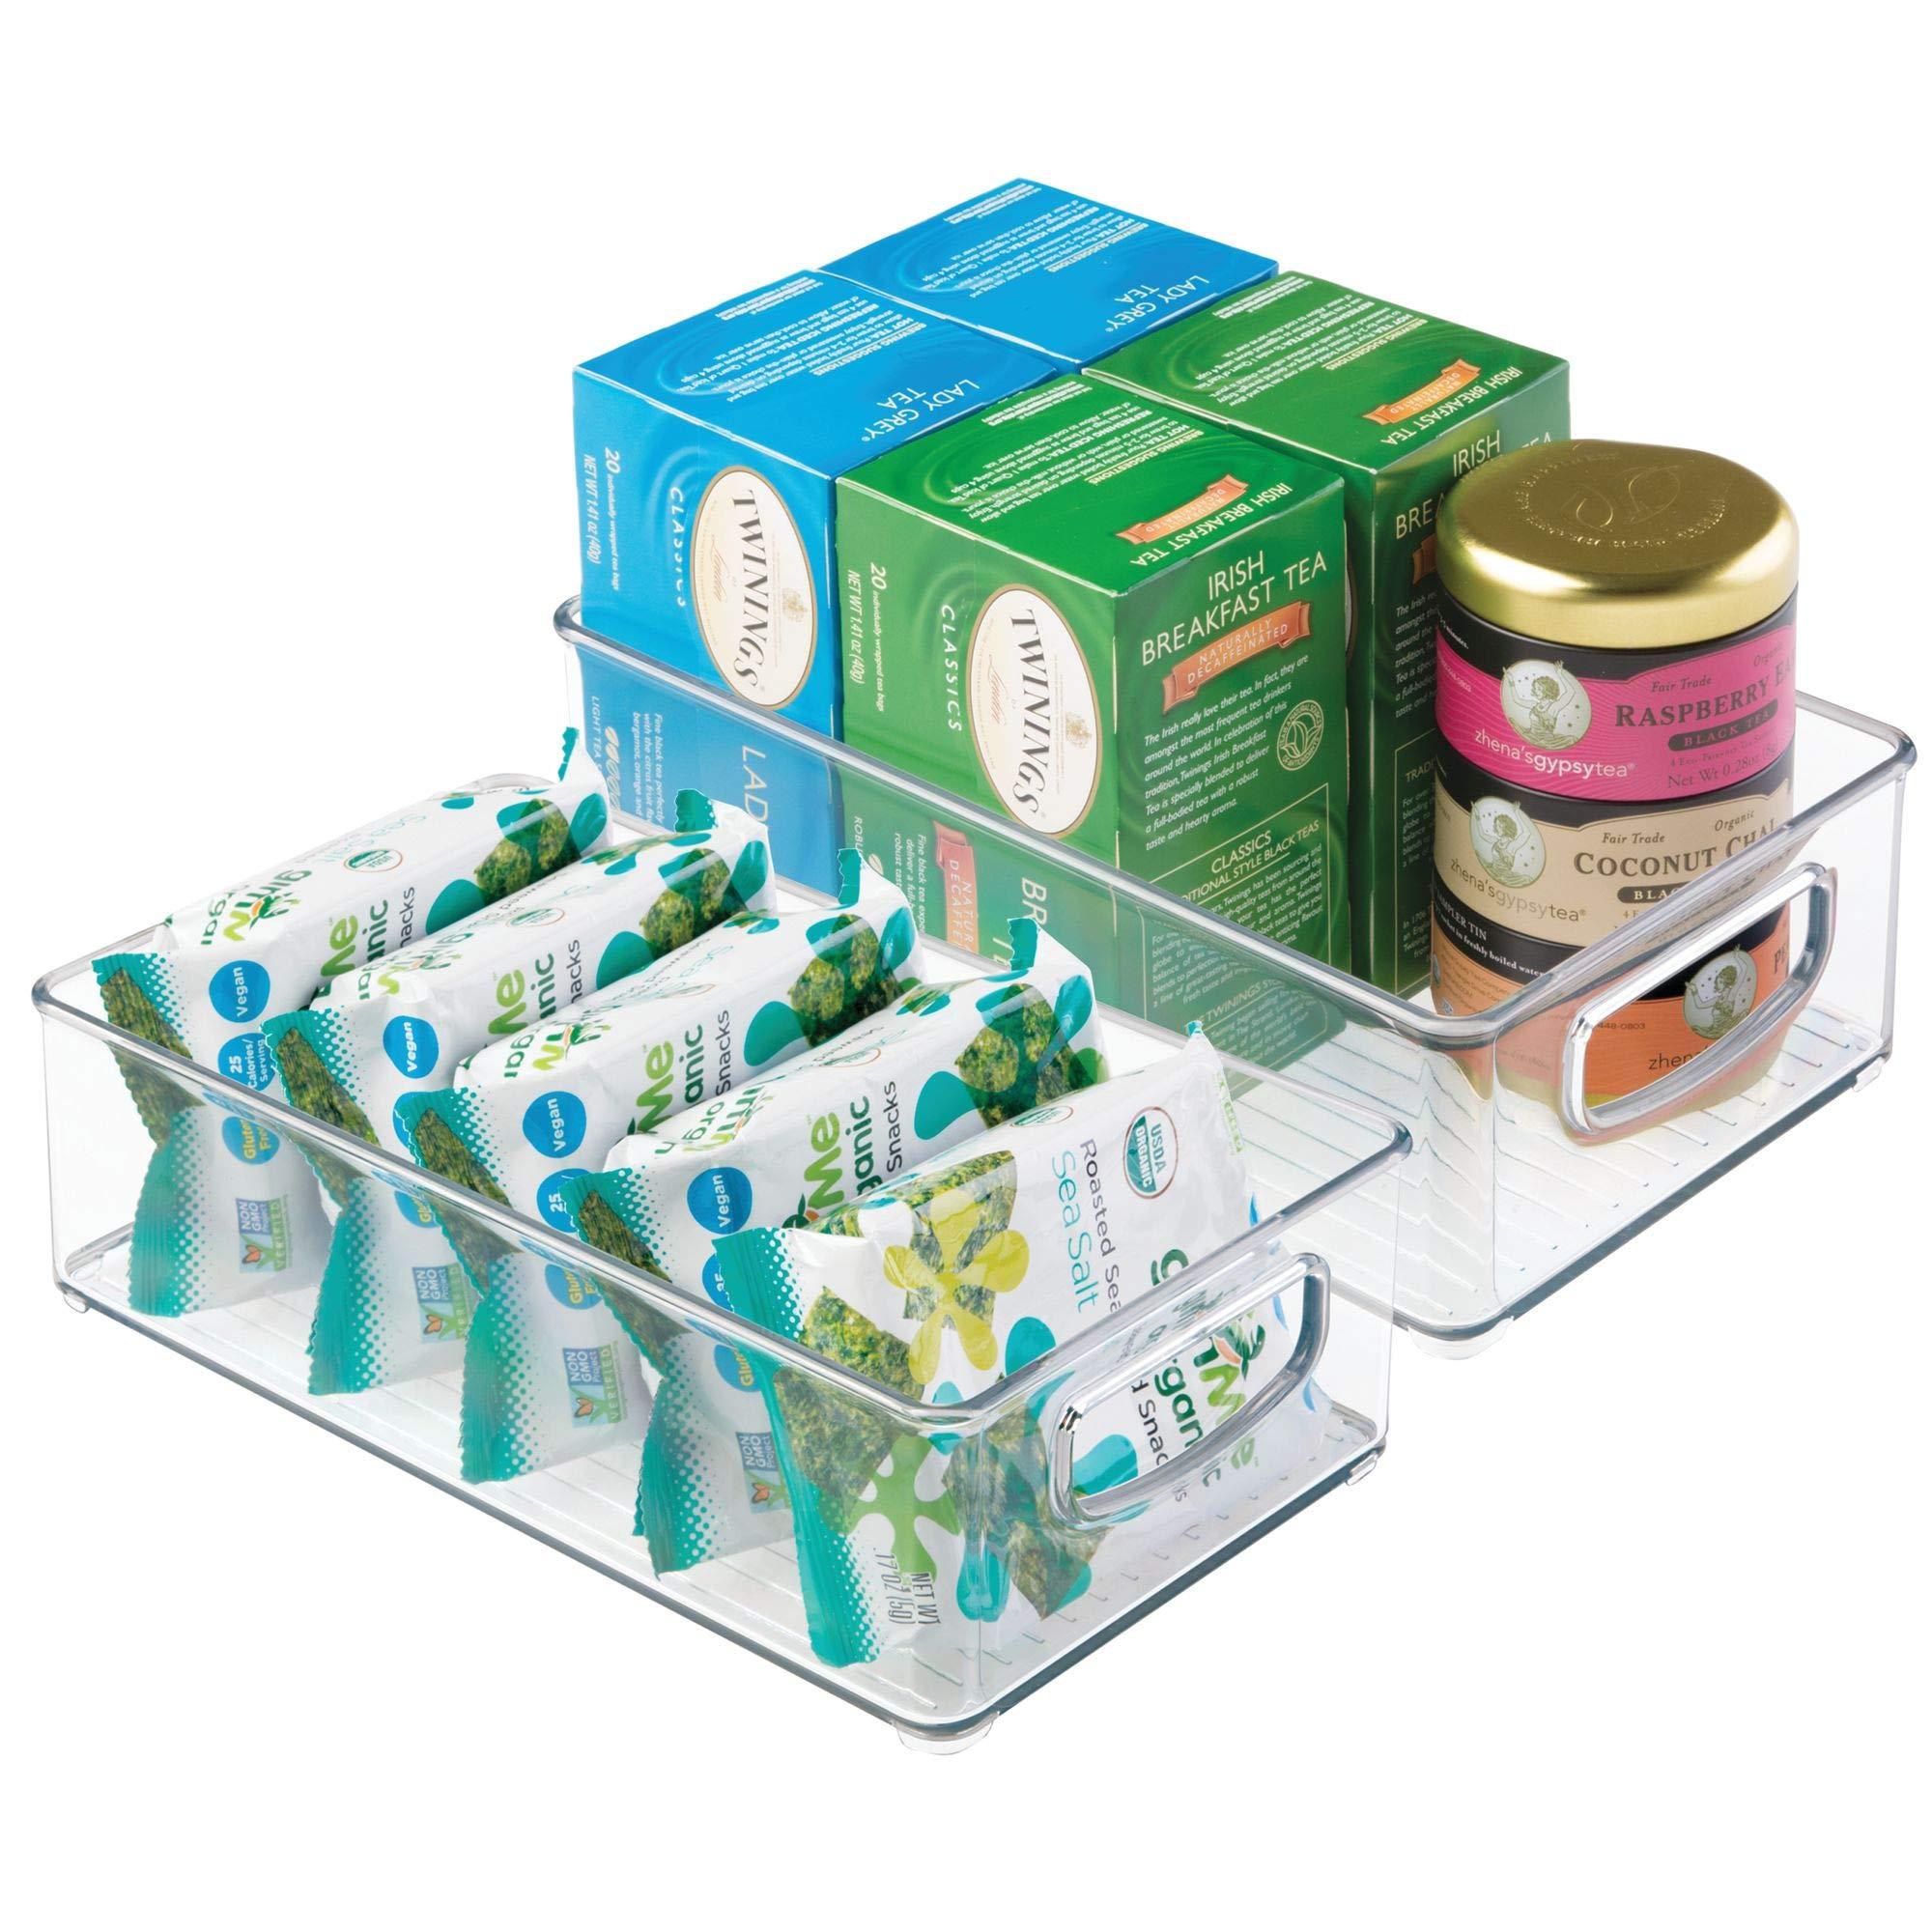 mDesign Plastic Kitchen Pantry Cabinet, Refrigerator or Freezer Food Storage Bins with Handles - Organizer for Fruit, Yogurt, Snacks, Pasta - Food Safe, BPA Free, 10� Long - 2 Pack, Clear